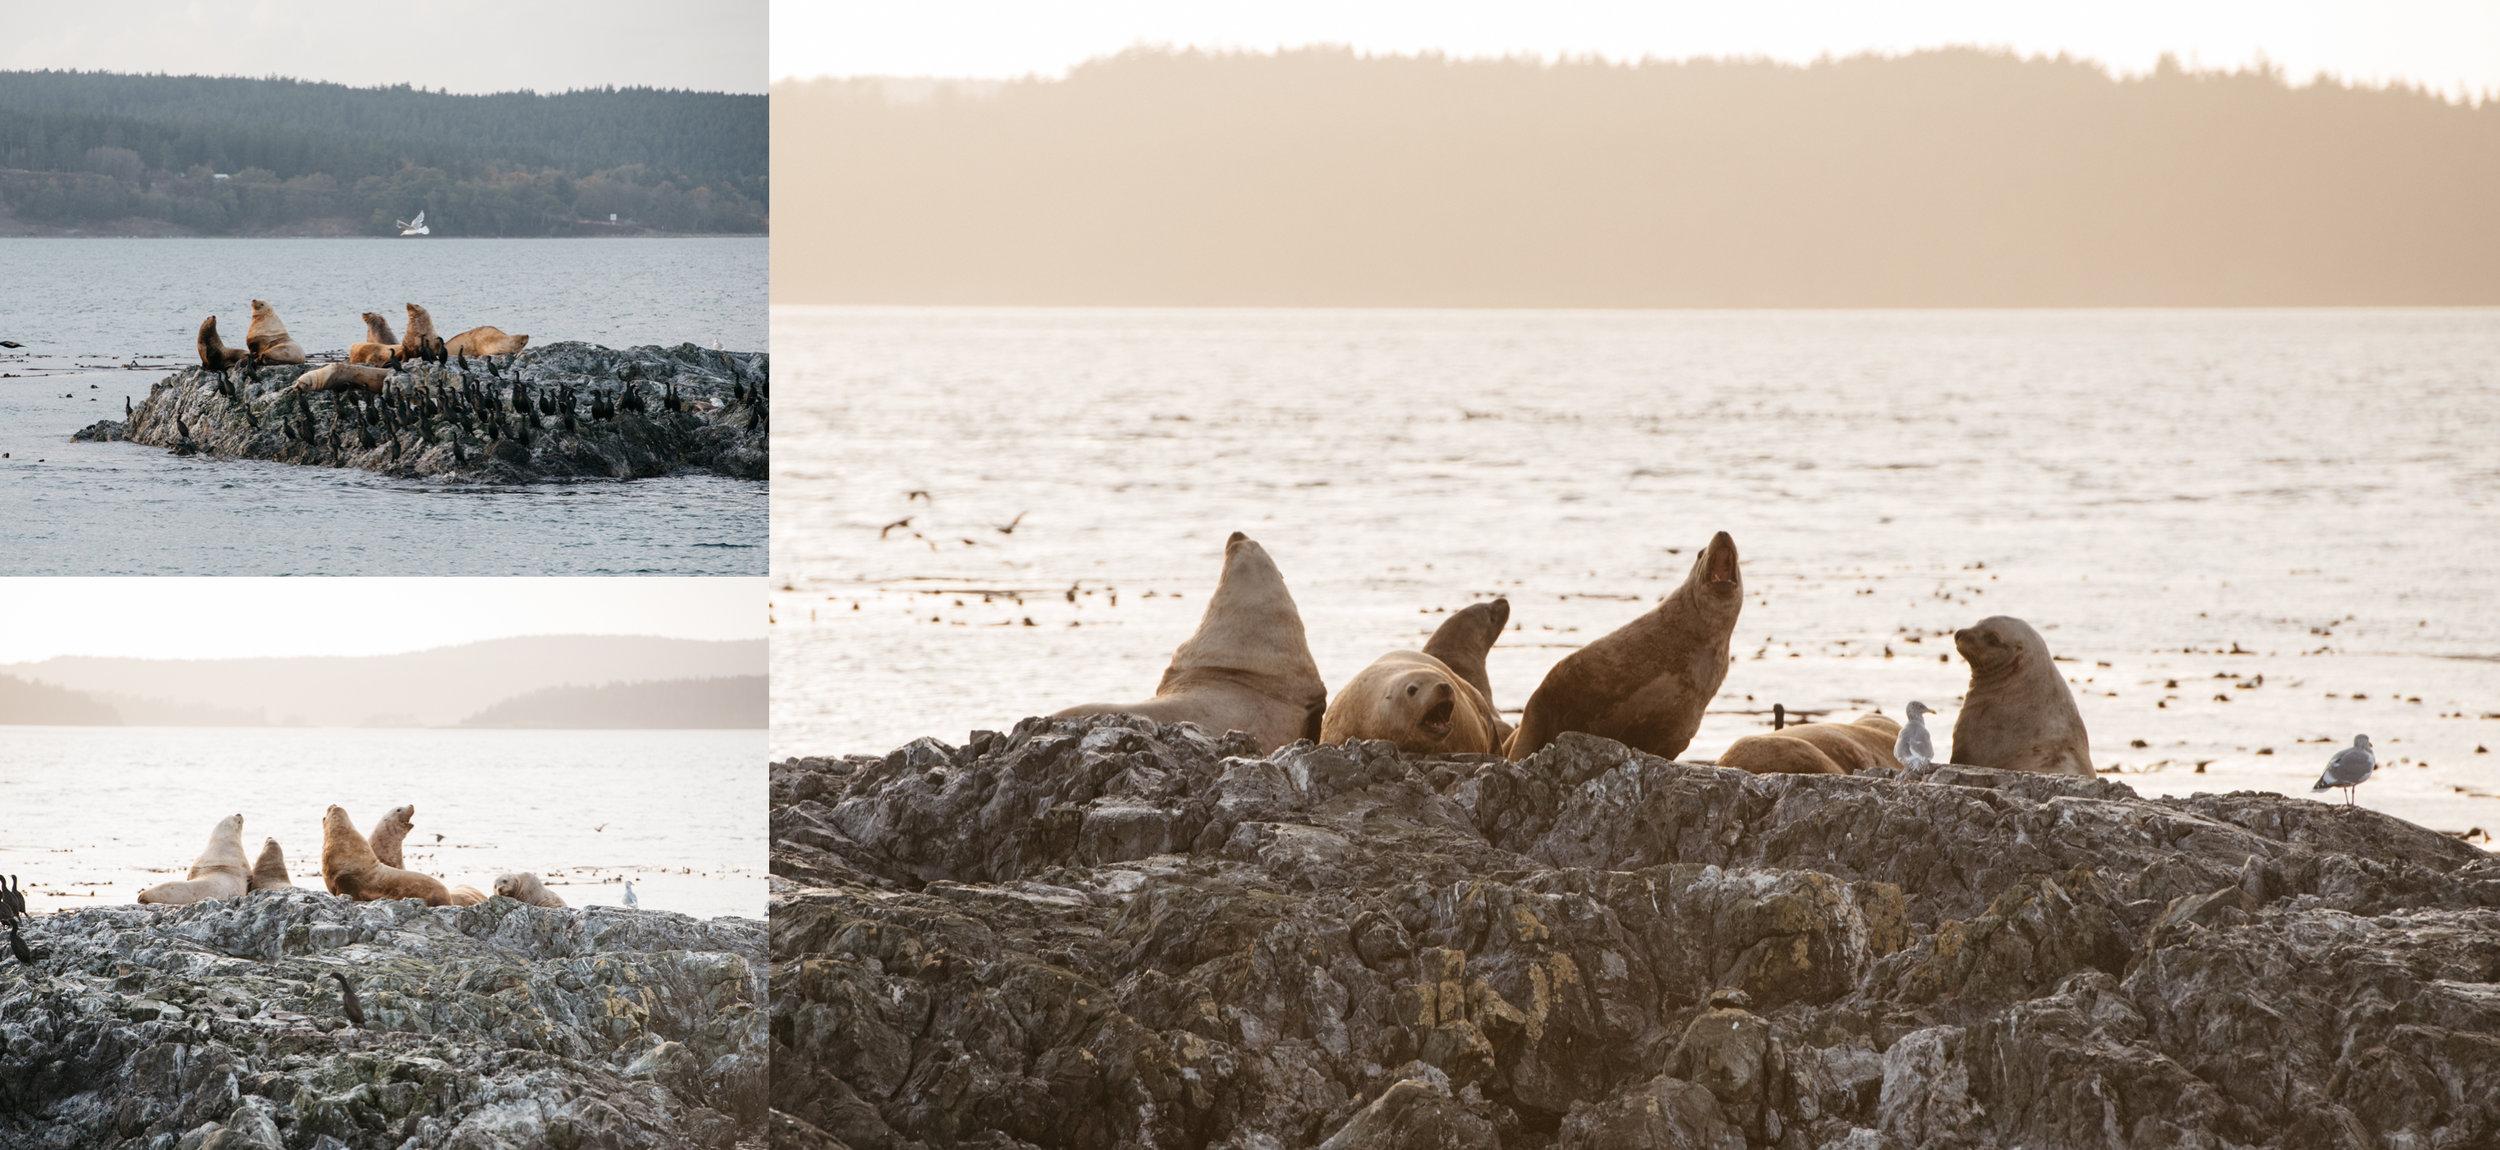 seals anacortes washington mariah fisher travel photography.jpg